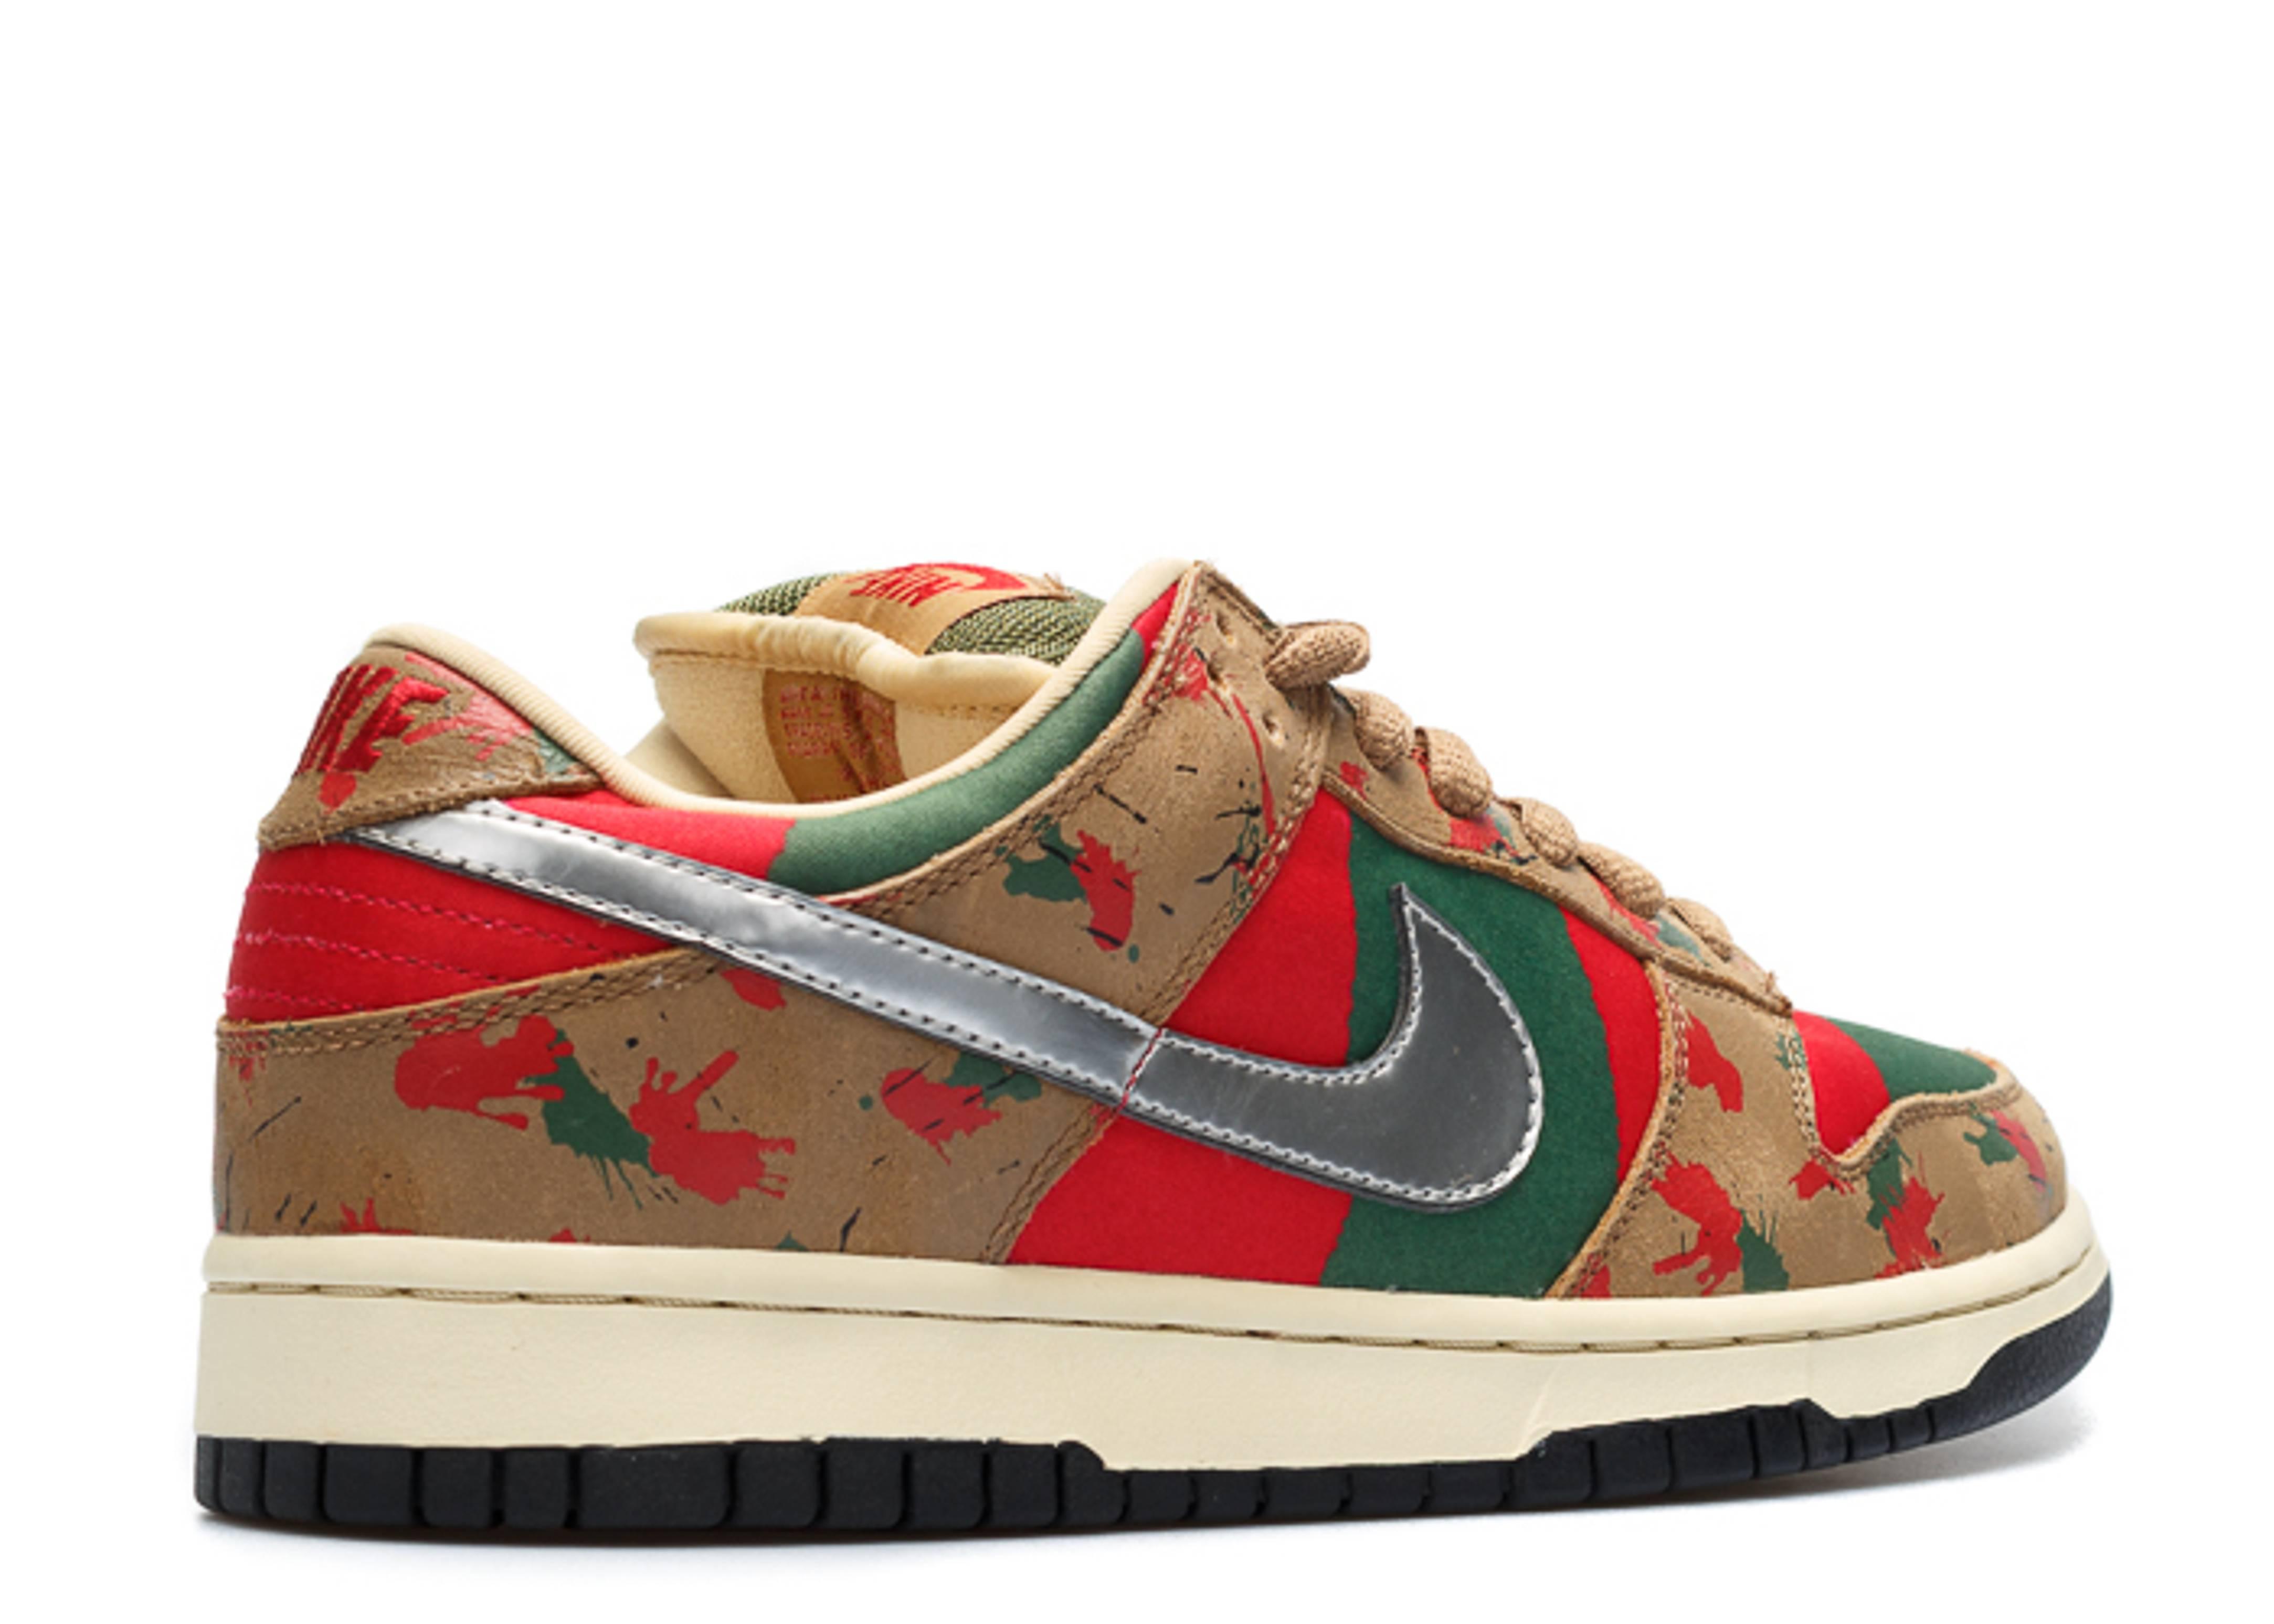 check out 65273 1d673 Nike Sb Dunk Freddy Krueger High Tops Blood splatter Custom Sneakers .. dunk  low pro sb taupechrome ...